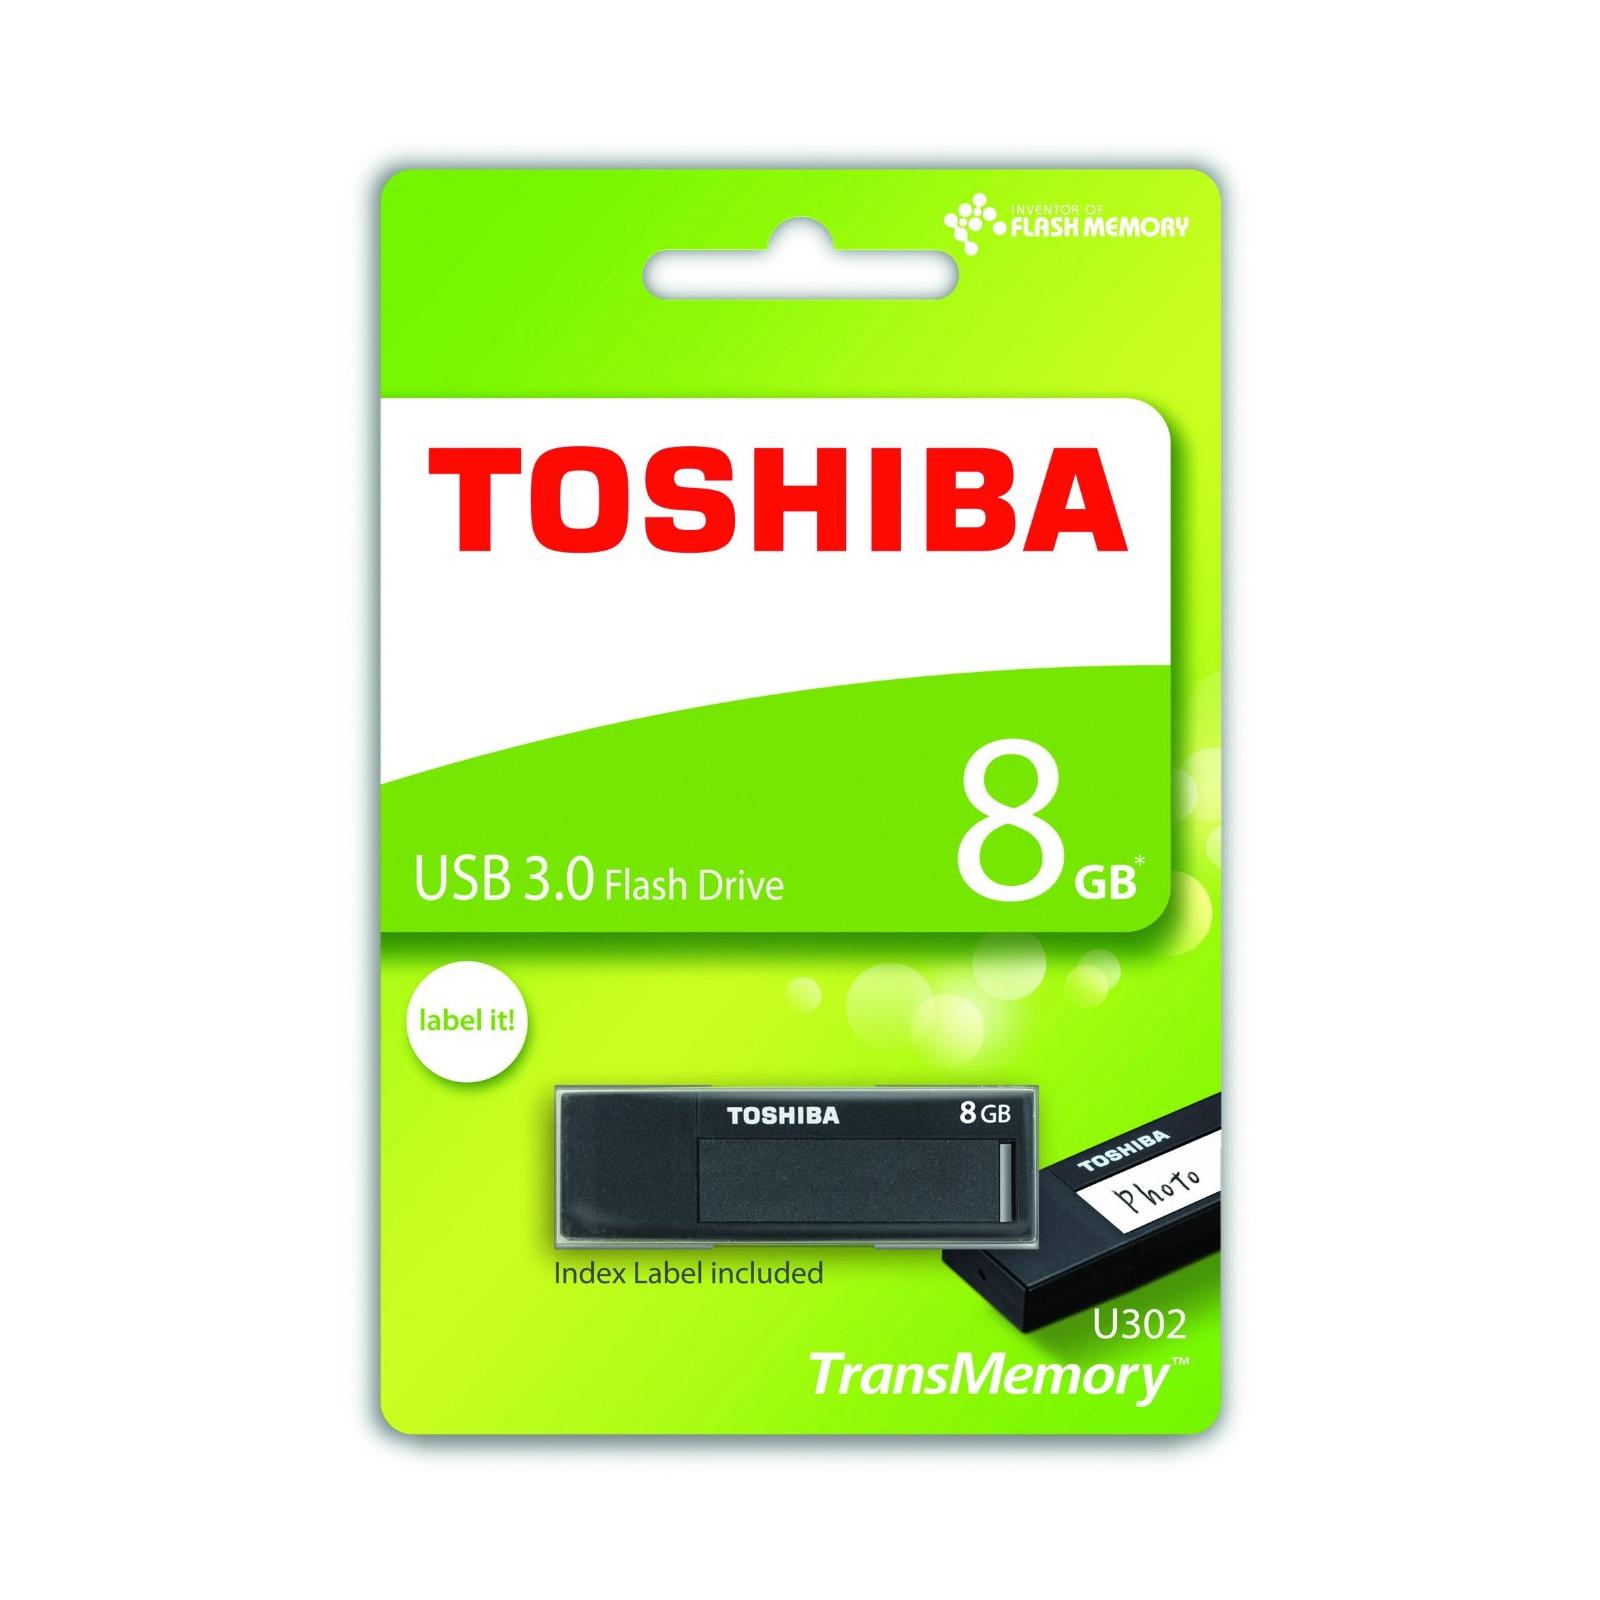 USB флеш накопитель TOSHIBA 8GB Daichi Black USB 3.0 (THN-U302K0080M4) изображение 3